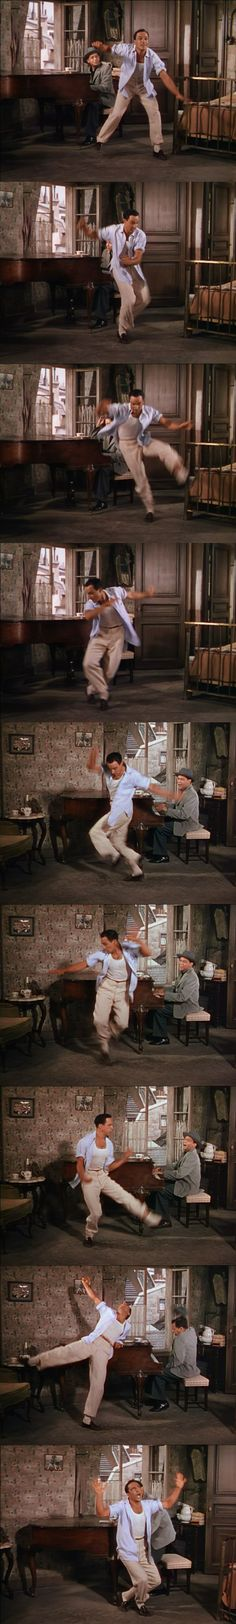 Gene Kelly Non-stop tap dancing An American in Paris 1951